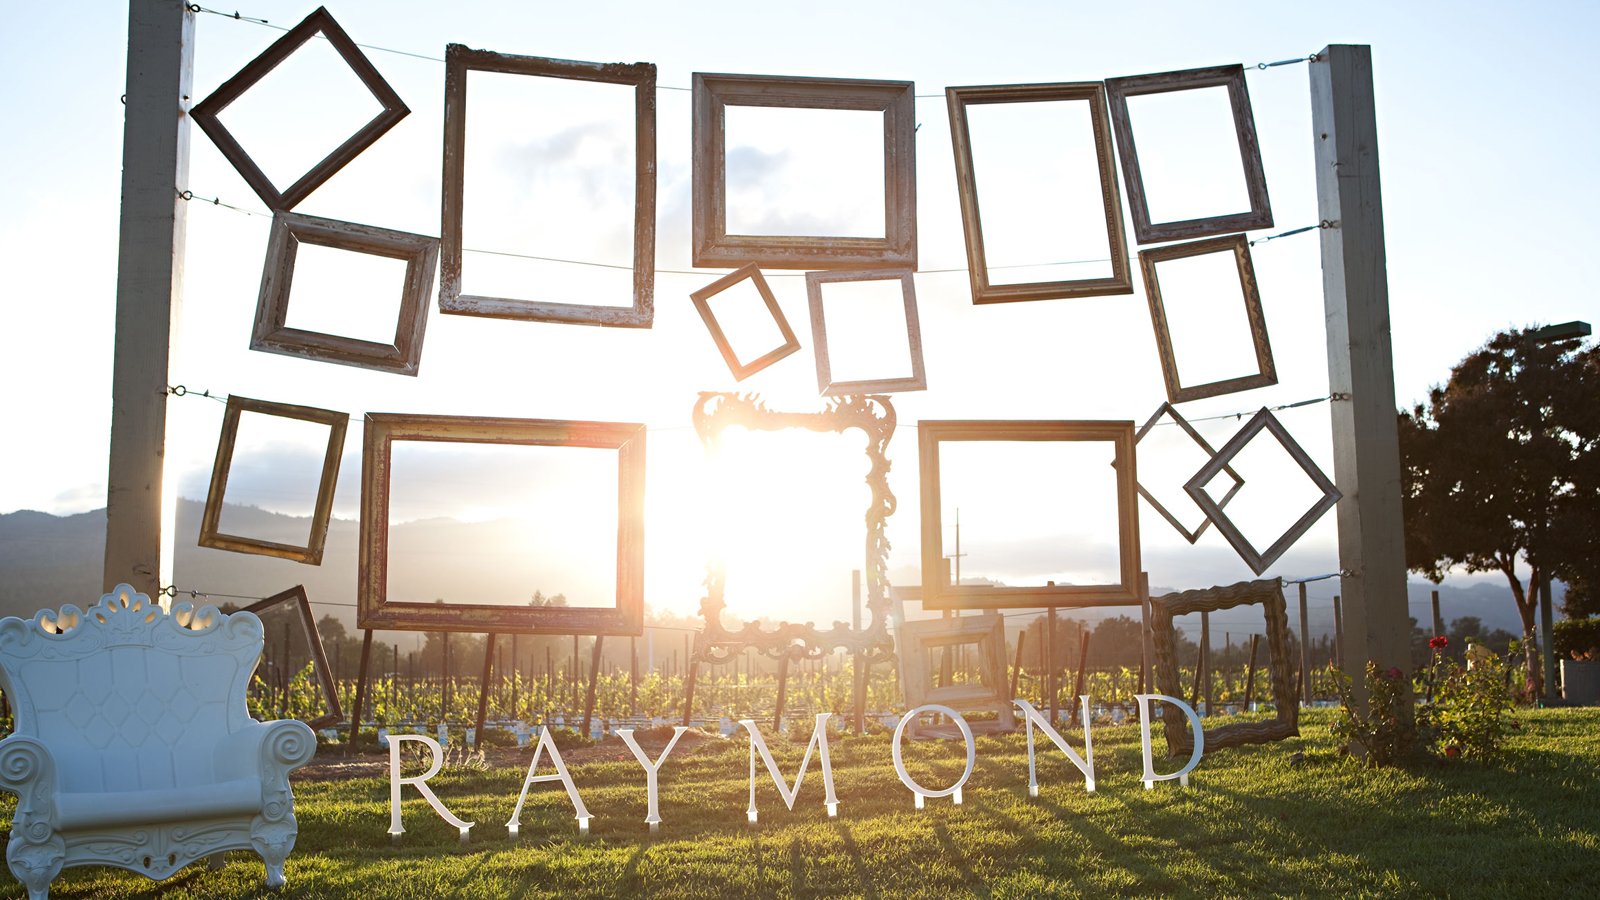 Raymond Vineyards Gallery Boisset Collection